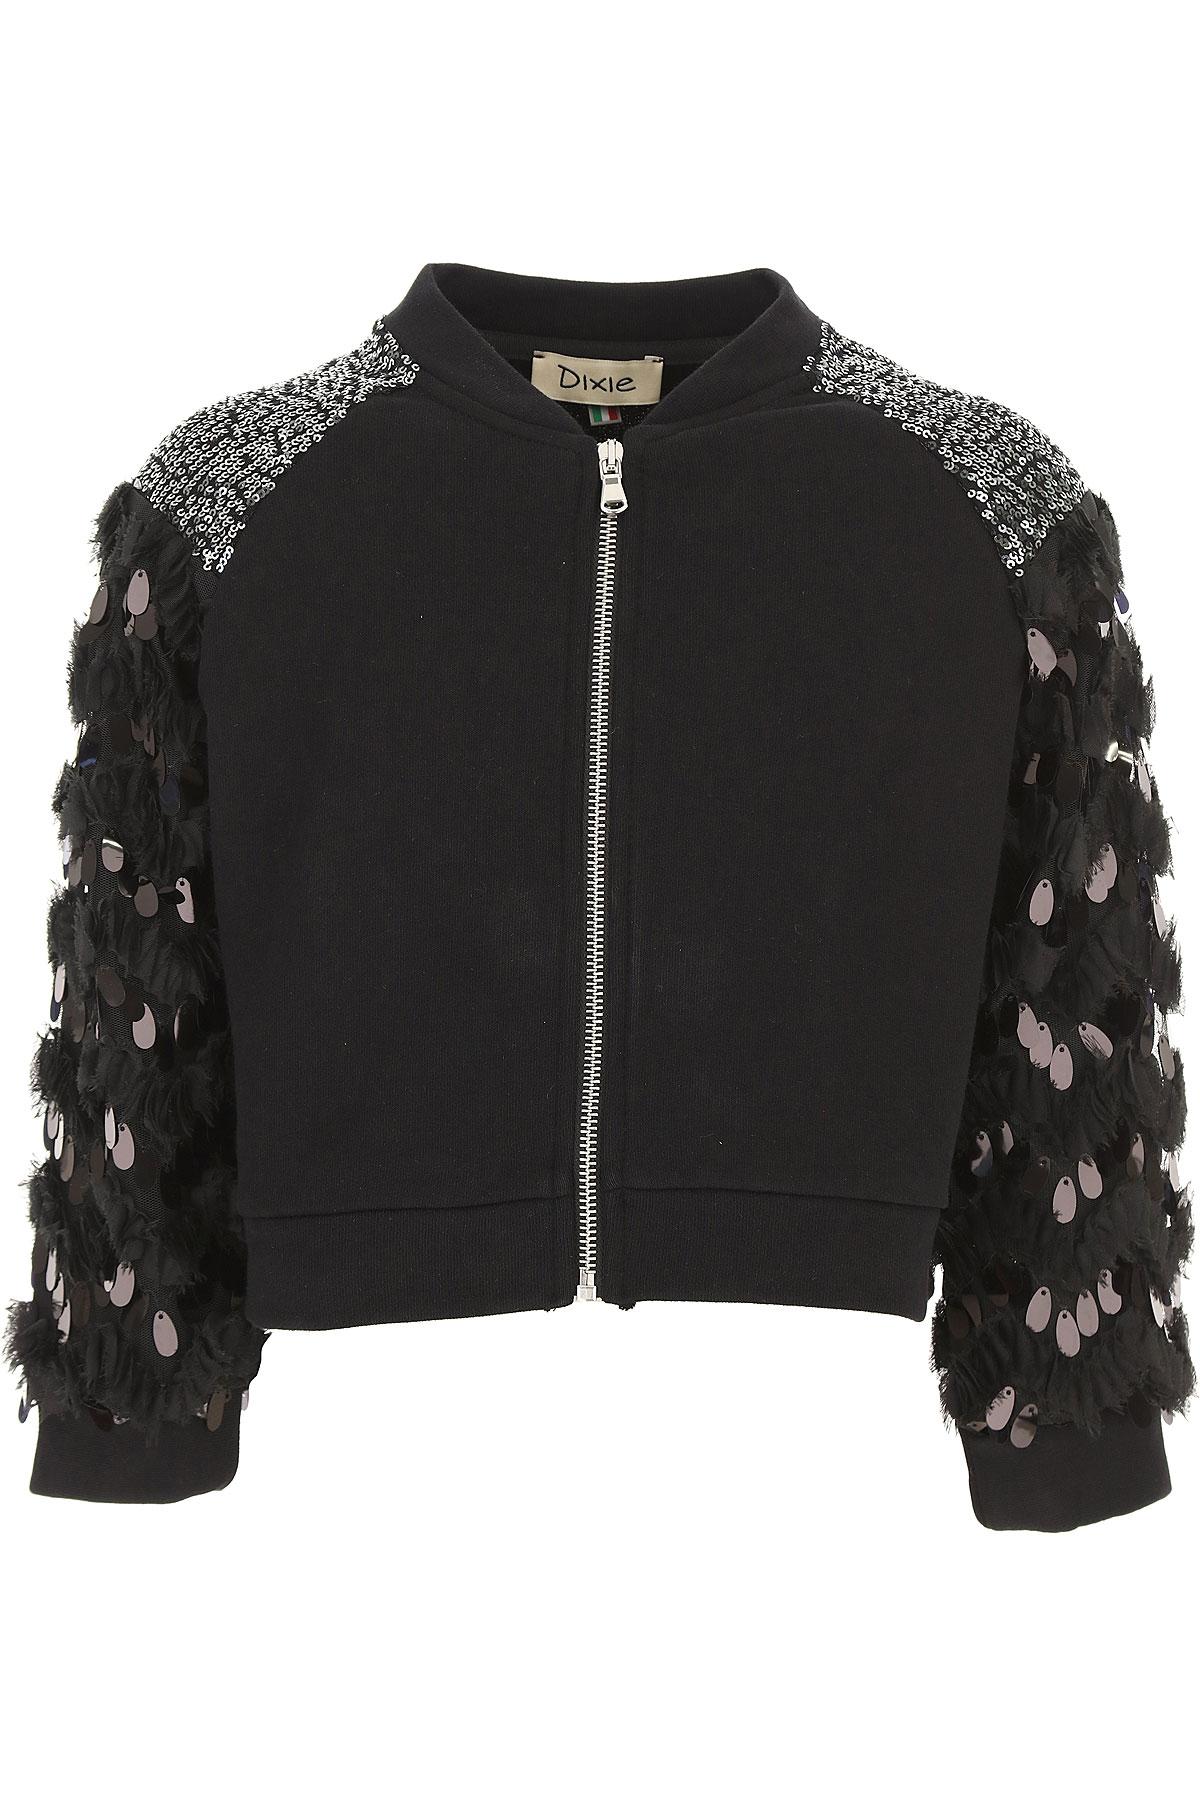 Dixie Kids Sweatshirts & Hoodies for Girls On Sale, Black, Cotton, 2019, M S XL XS